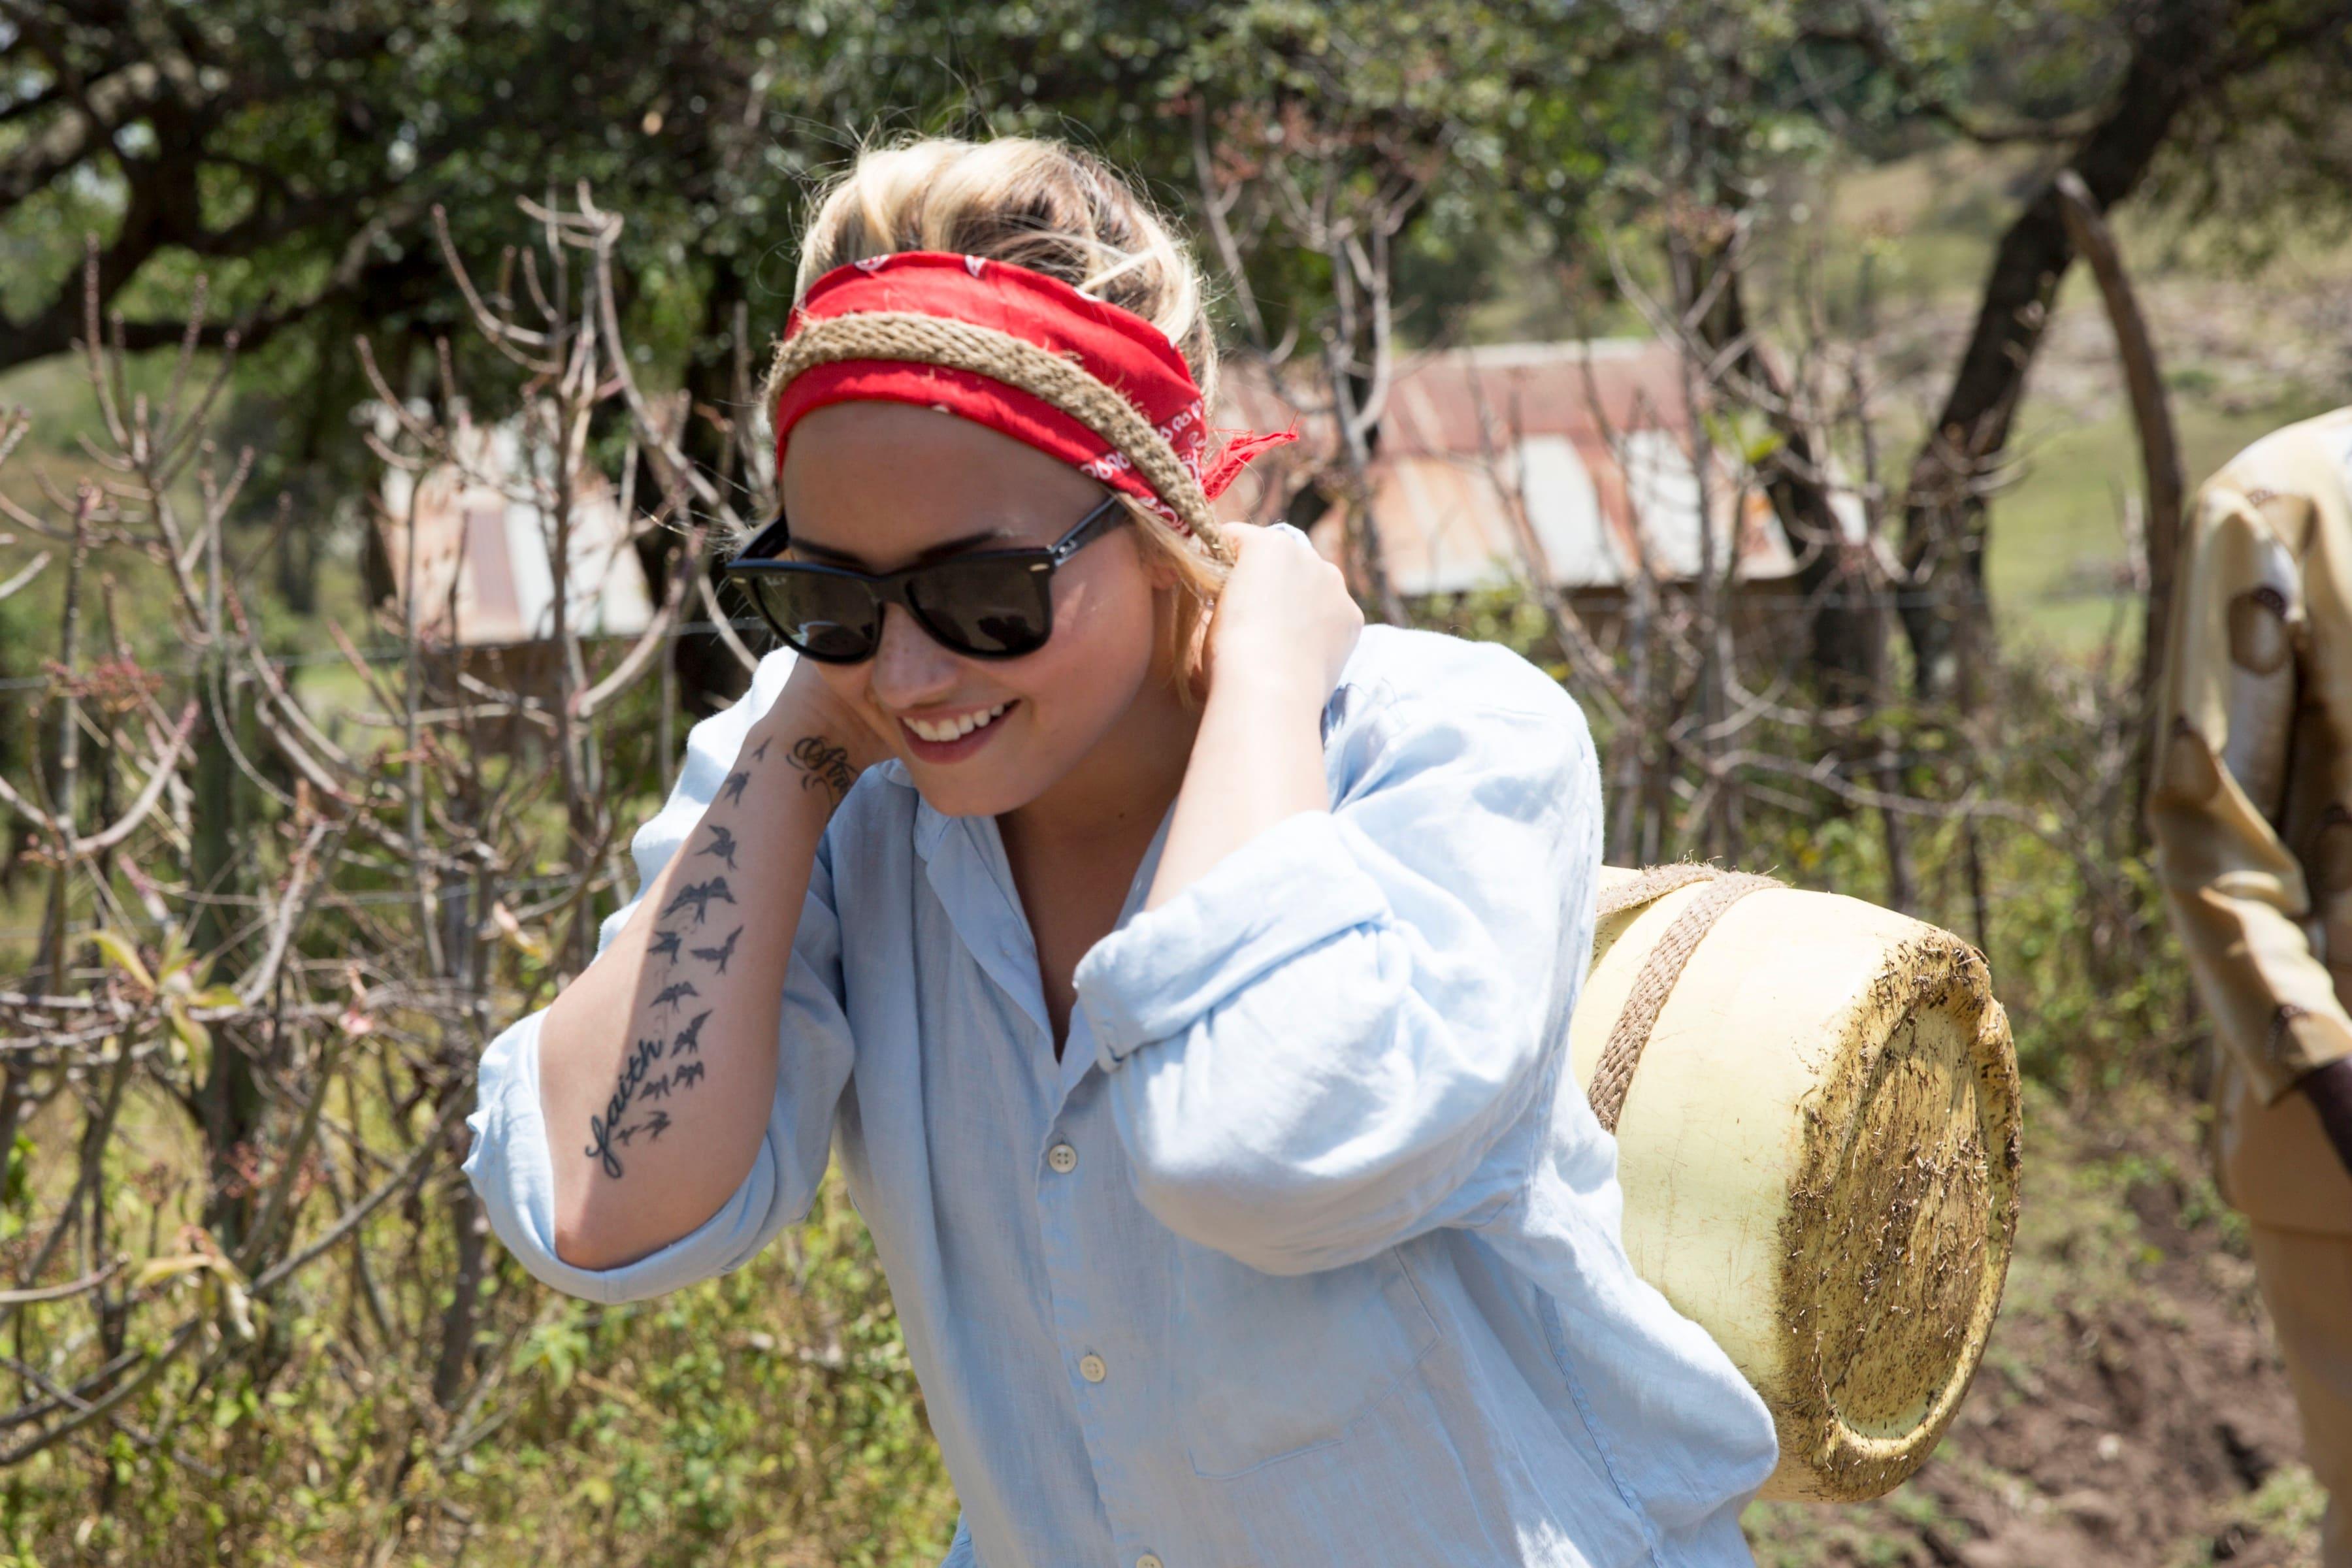 For her 21st birthday, Demi Lovato visited a Free The Children community in Kenya